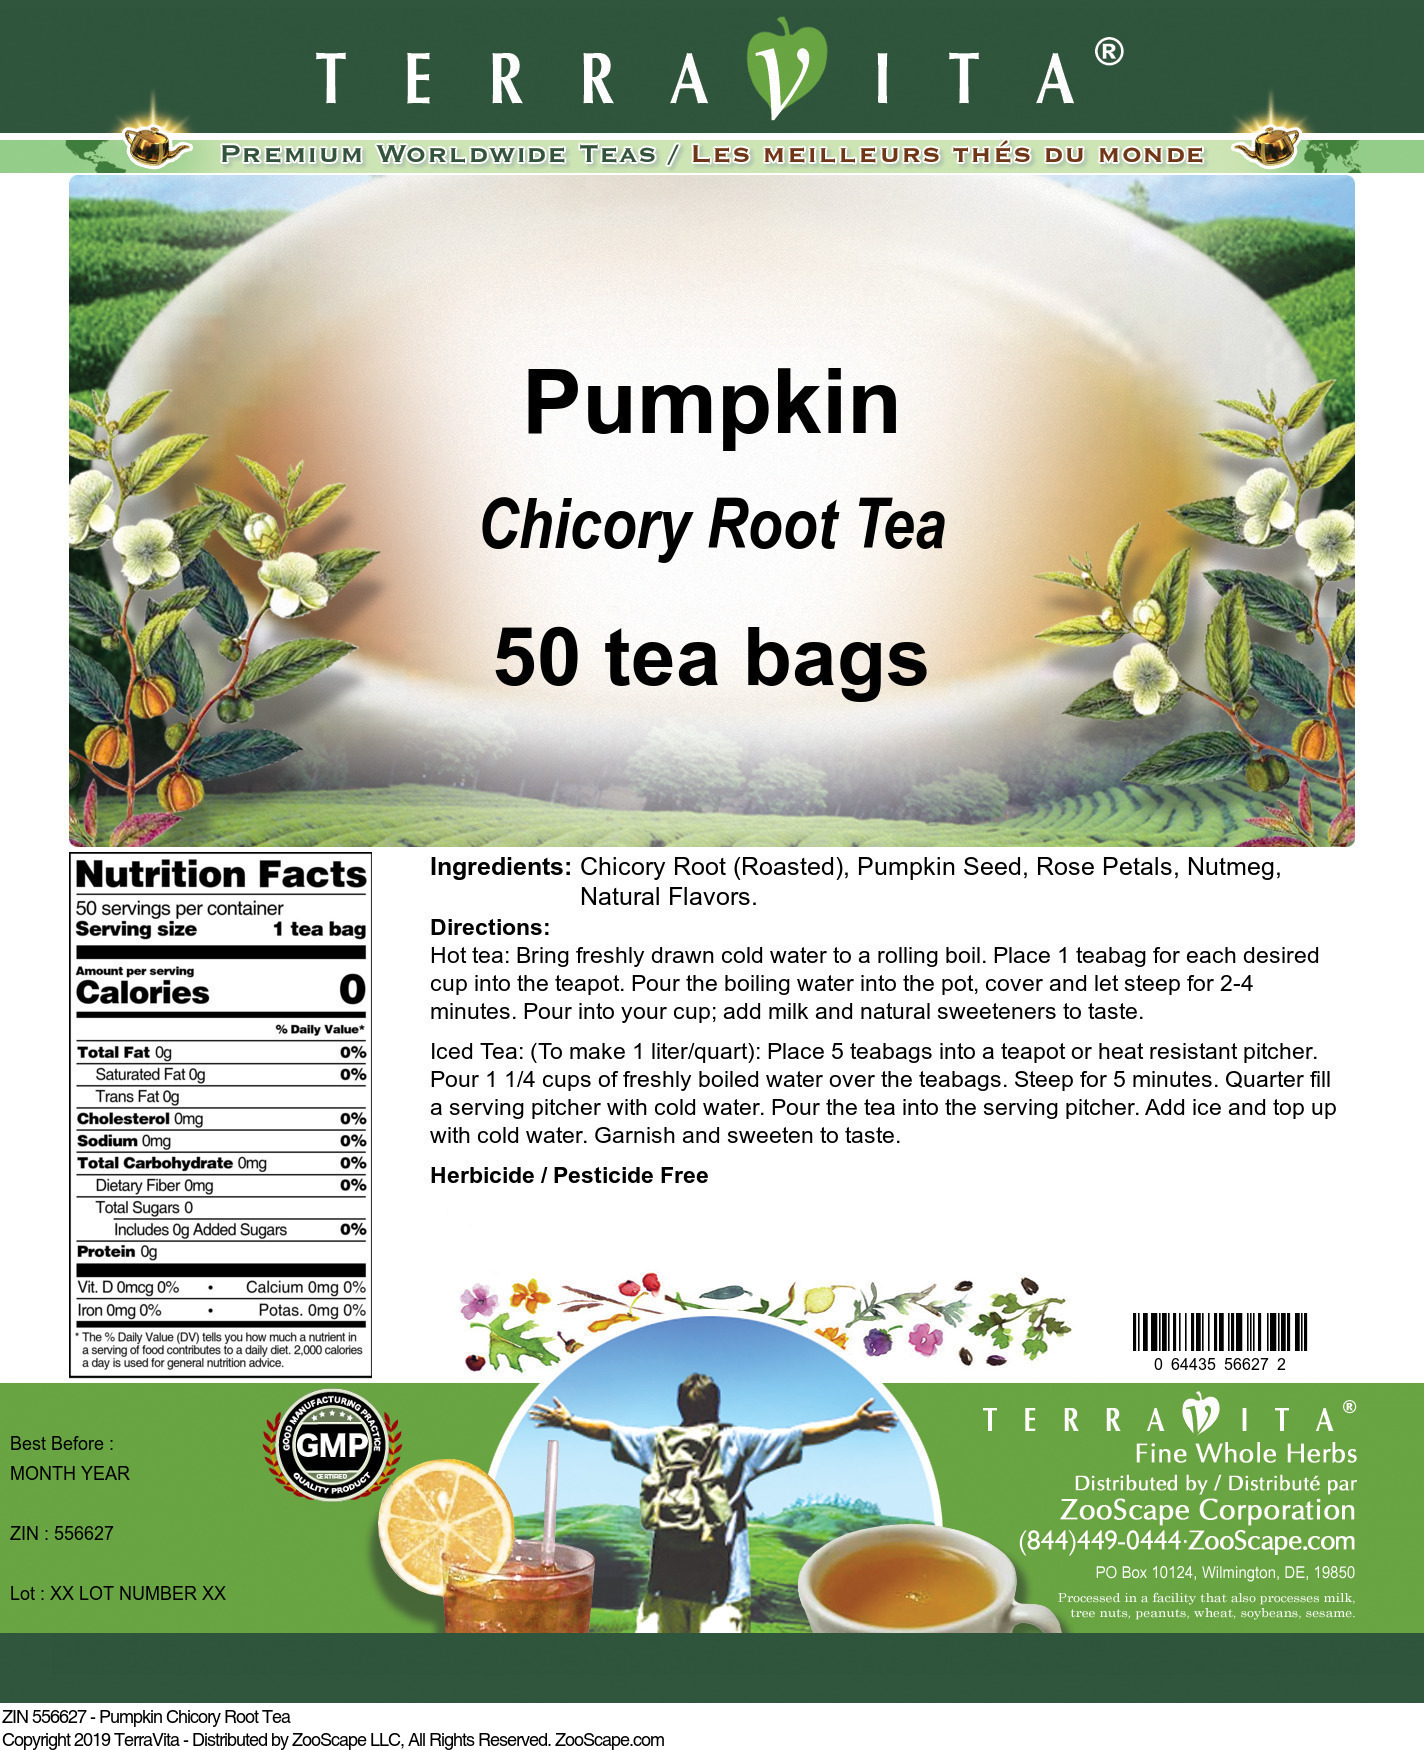 Pumpkin Chicory Root Tea